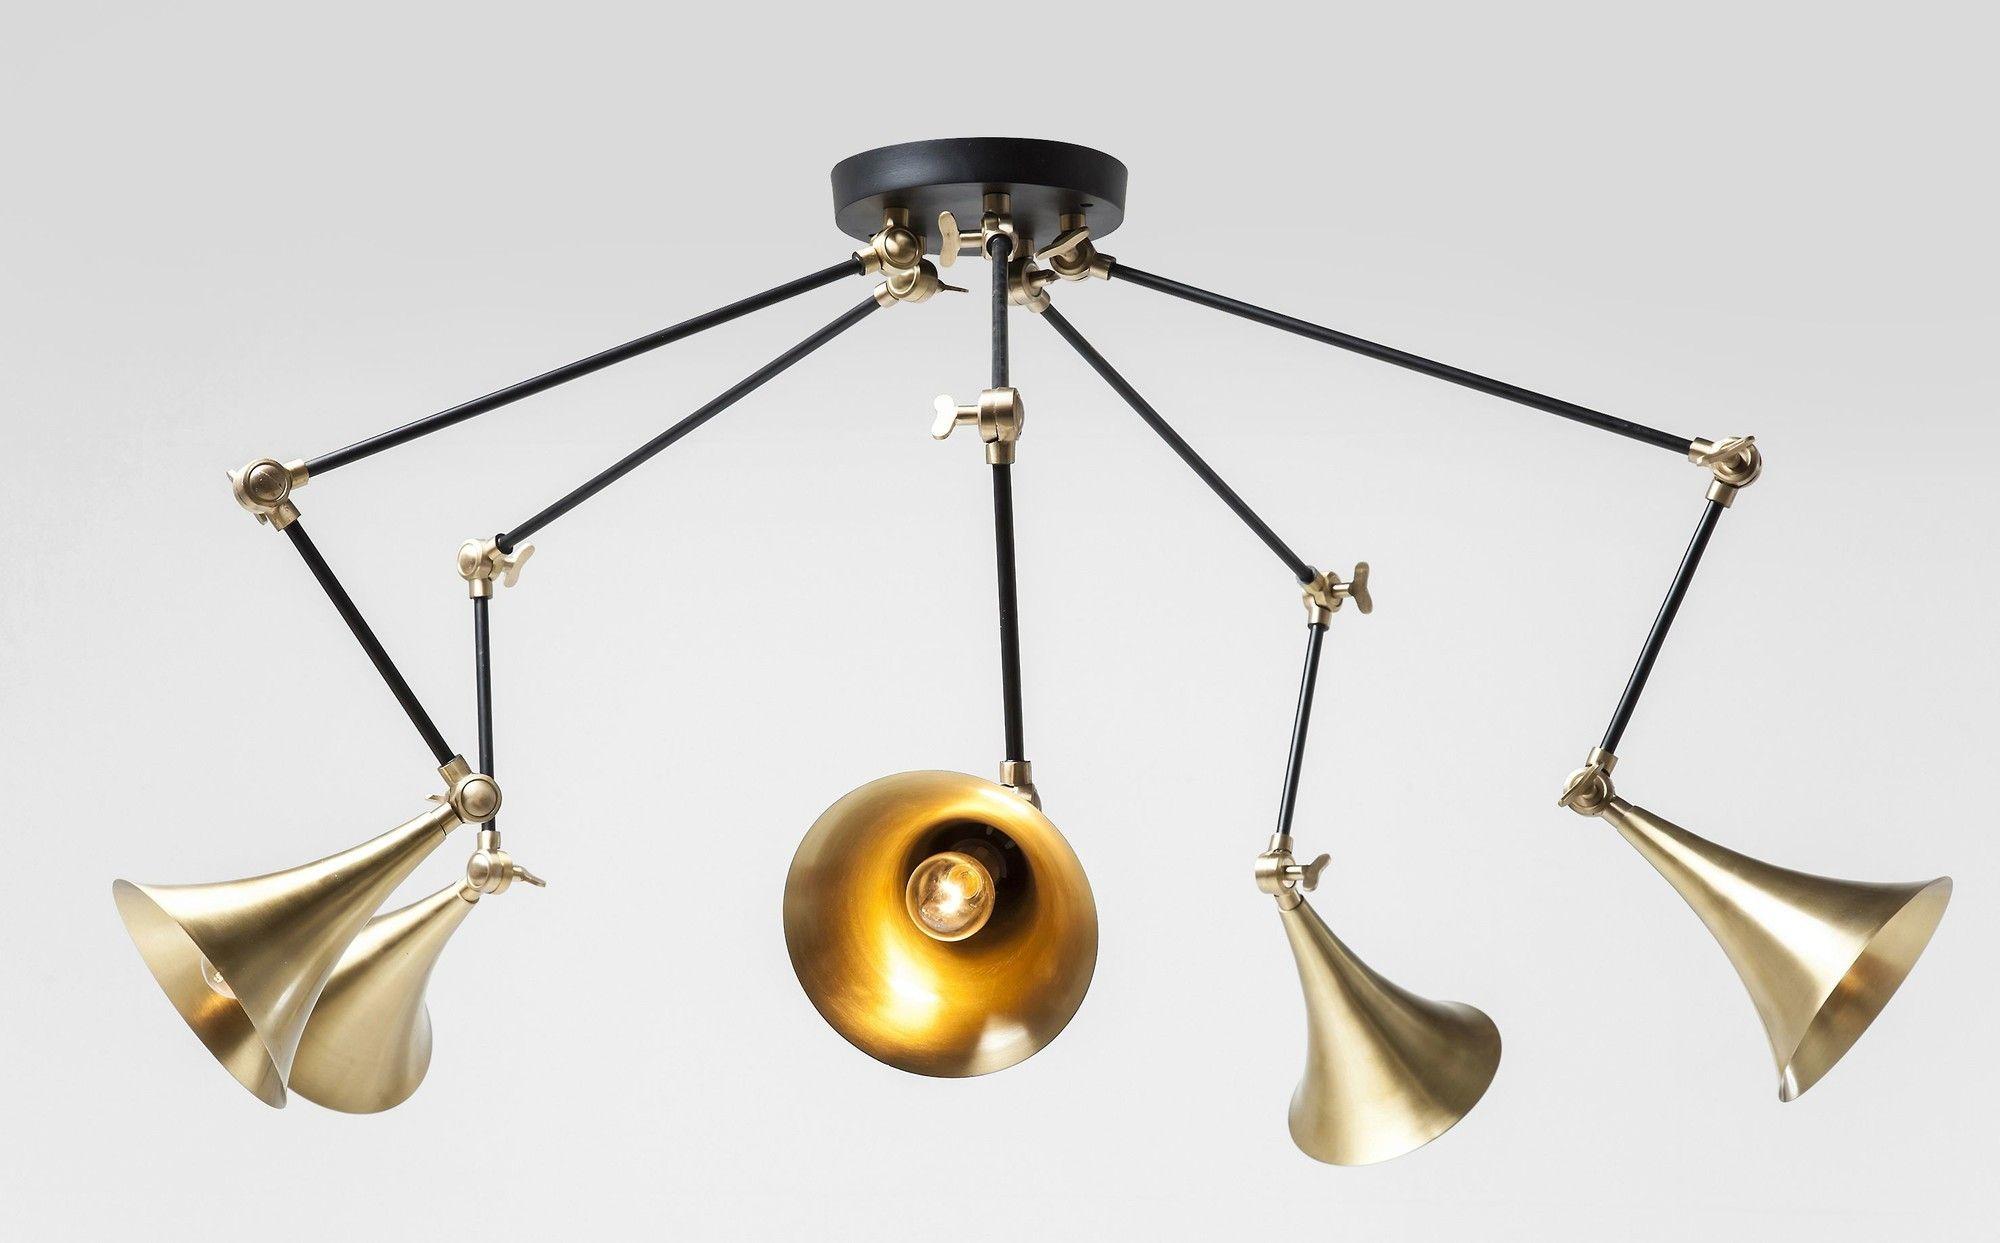 Spider hanglamp brons kare design verlichting